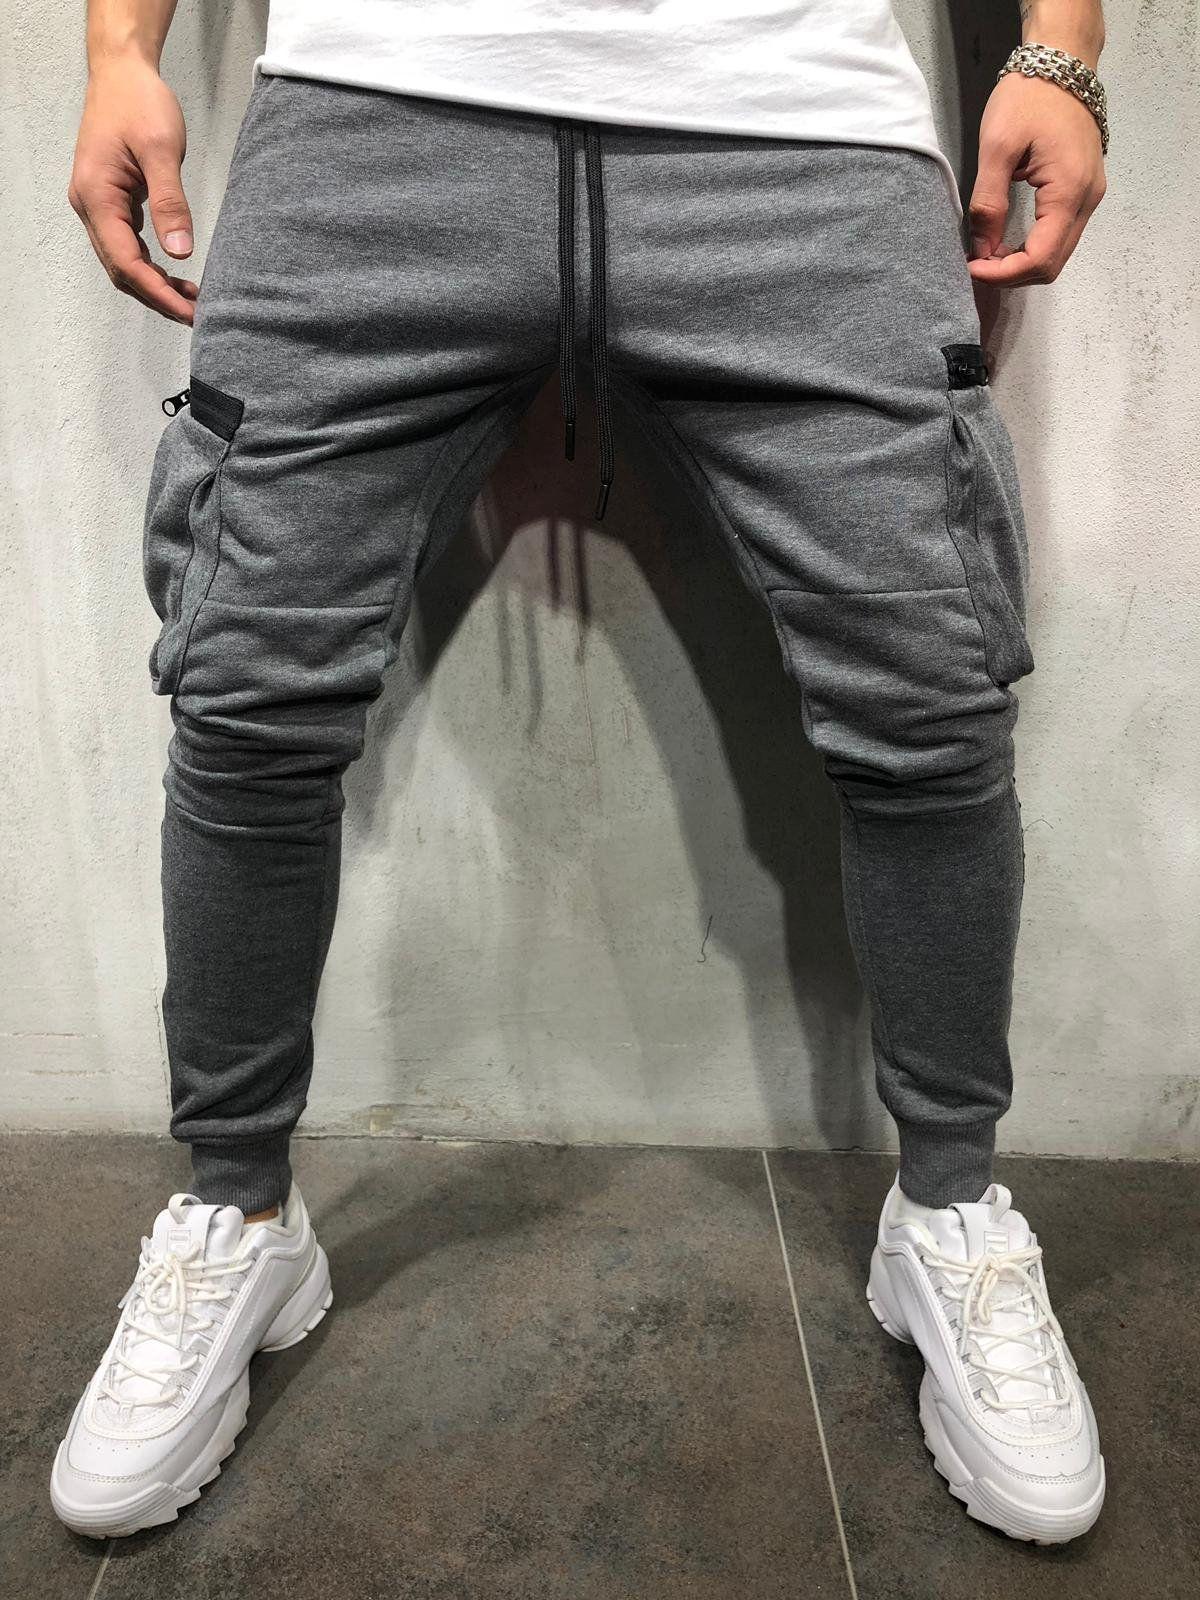 dcc2bb7d26 Cargo Jogger Sweatpants - Dark Gray in 2019 | Joggers | Fashion ...